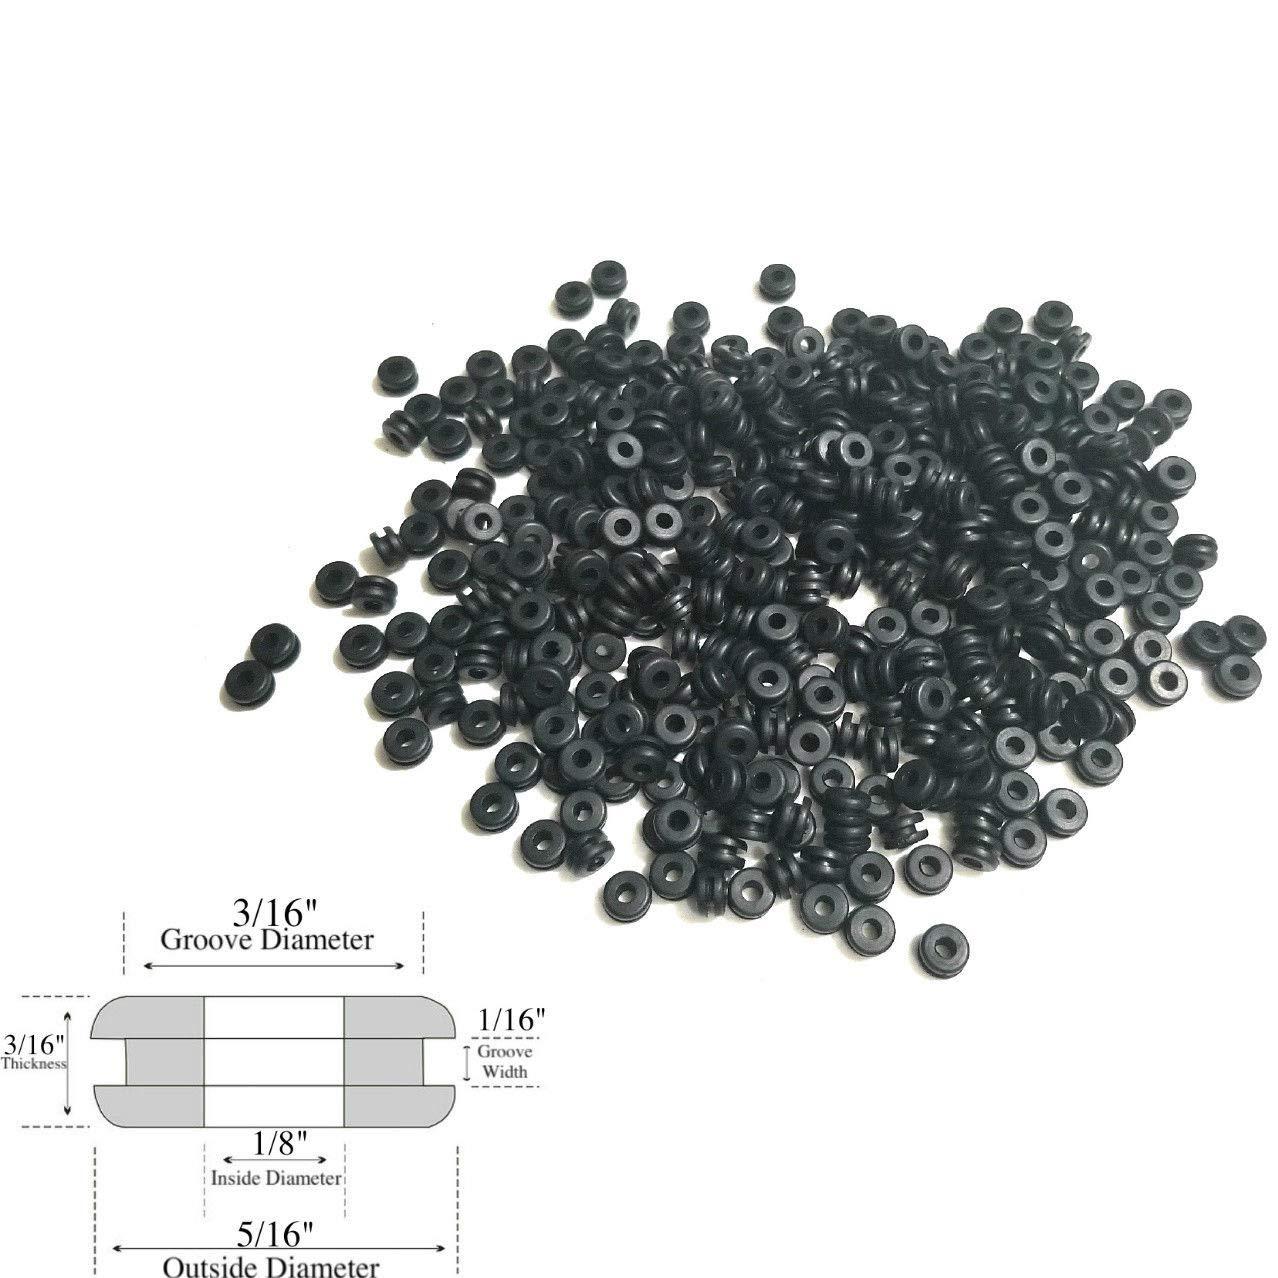 Lot of 100 Rubber Grommets 1/8'' Inside Diameter - 1/16'' Gw - Fits 3/16'' Holes